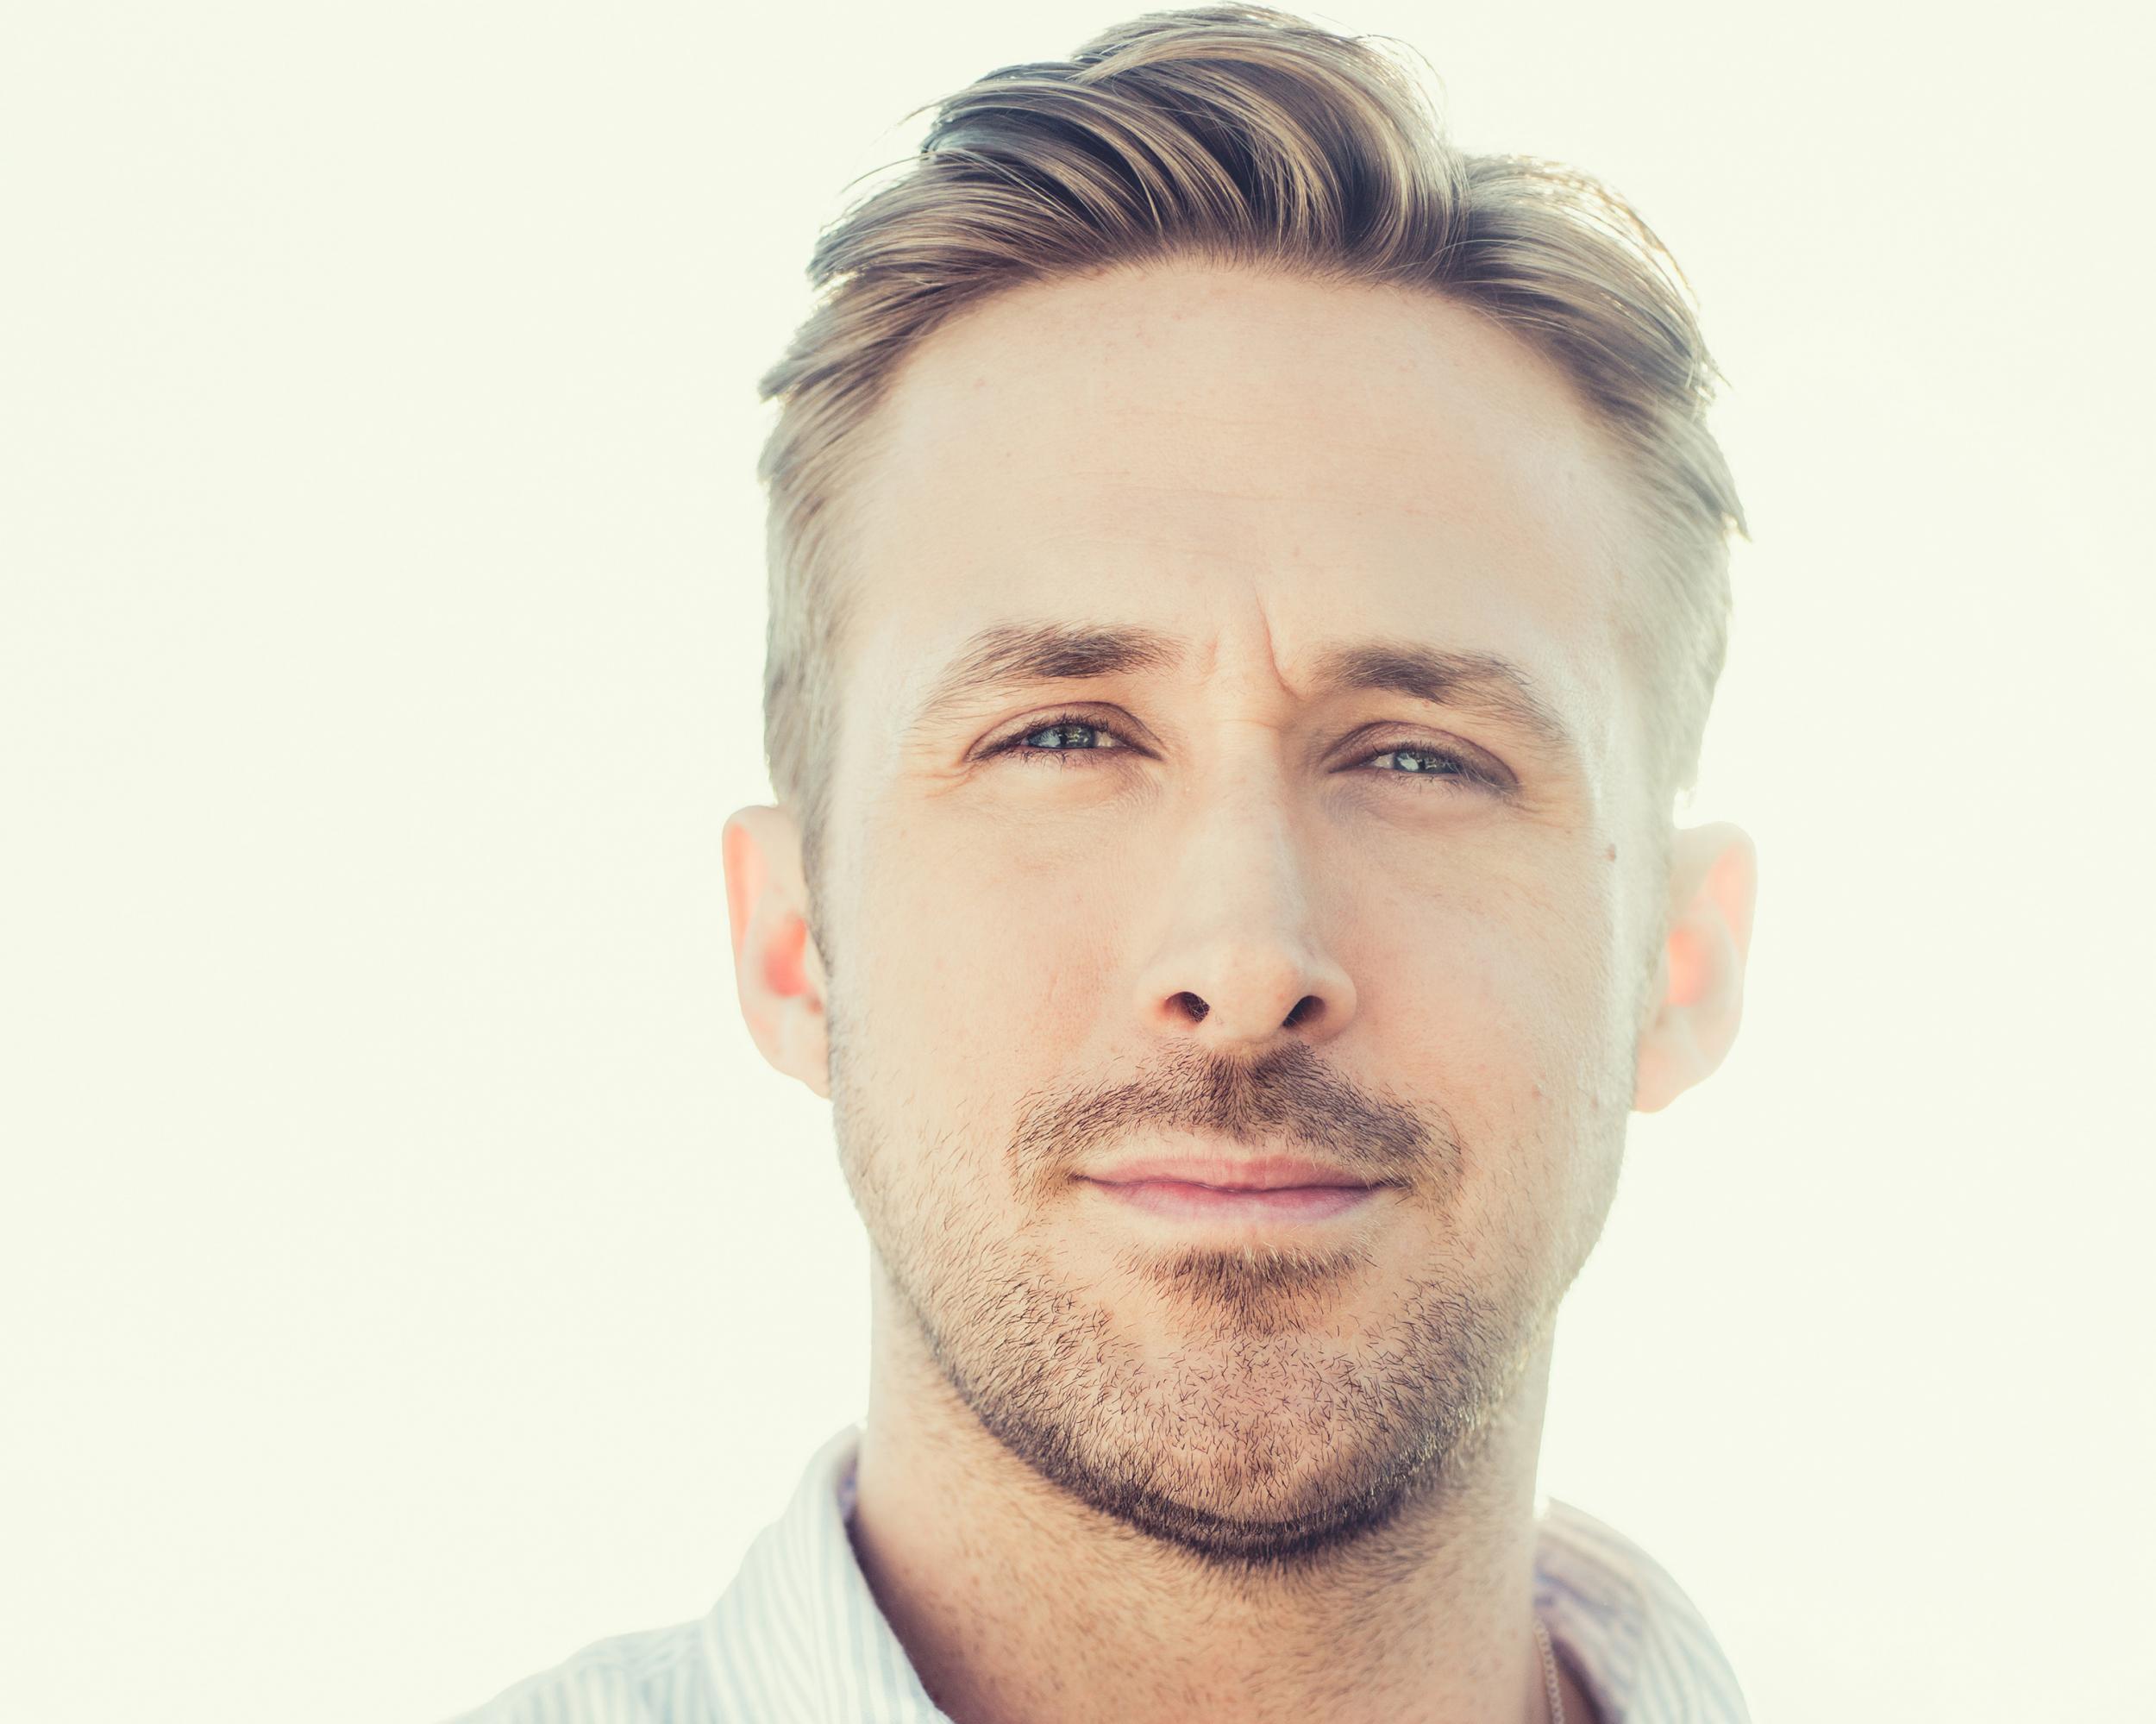 Ryan Gosling Hey Girl Wallpaper Ryan Gosling Women Are Better Than Men They Are